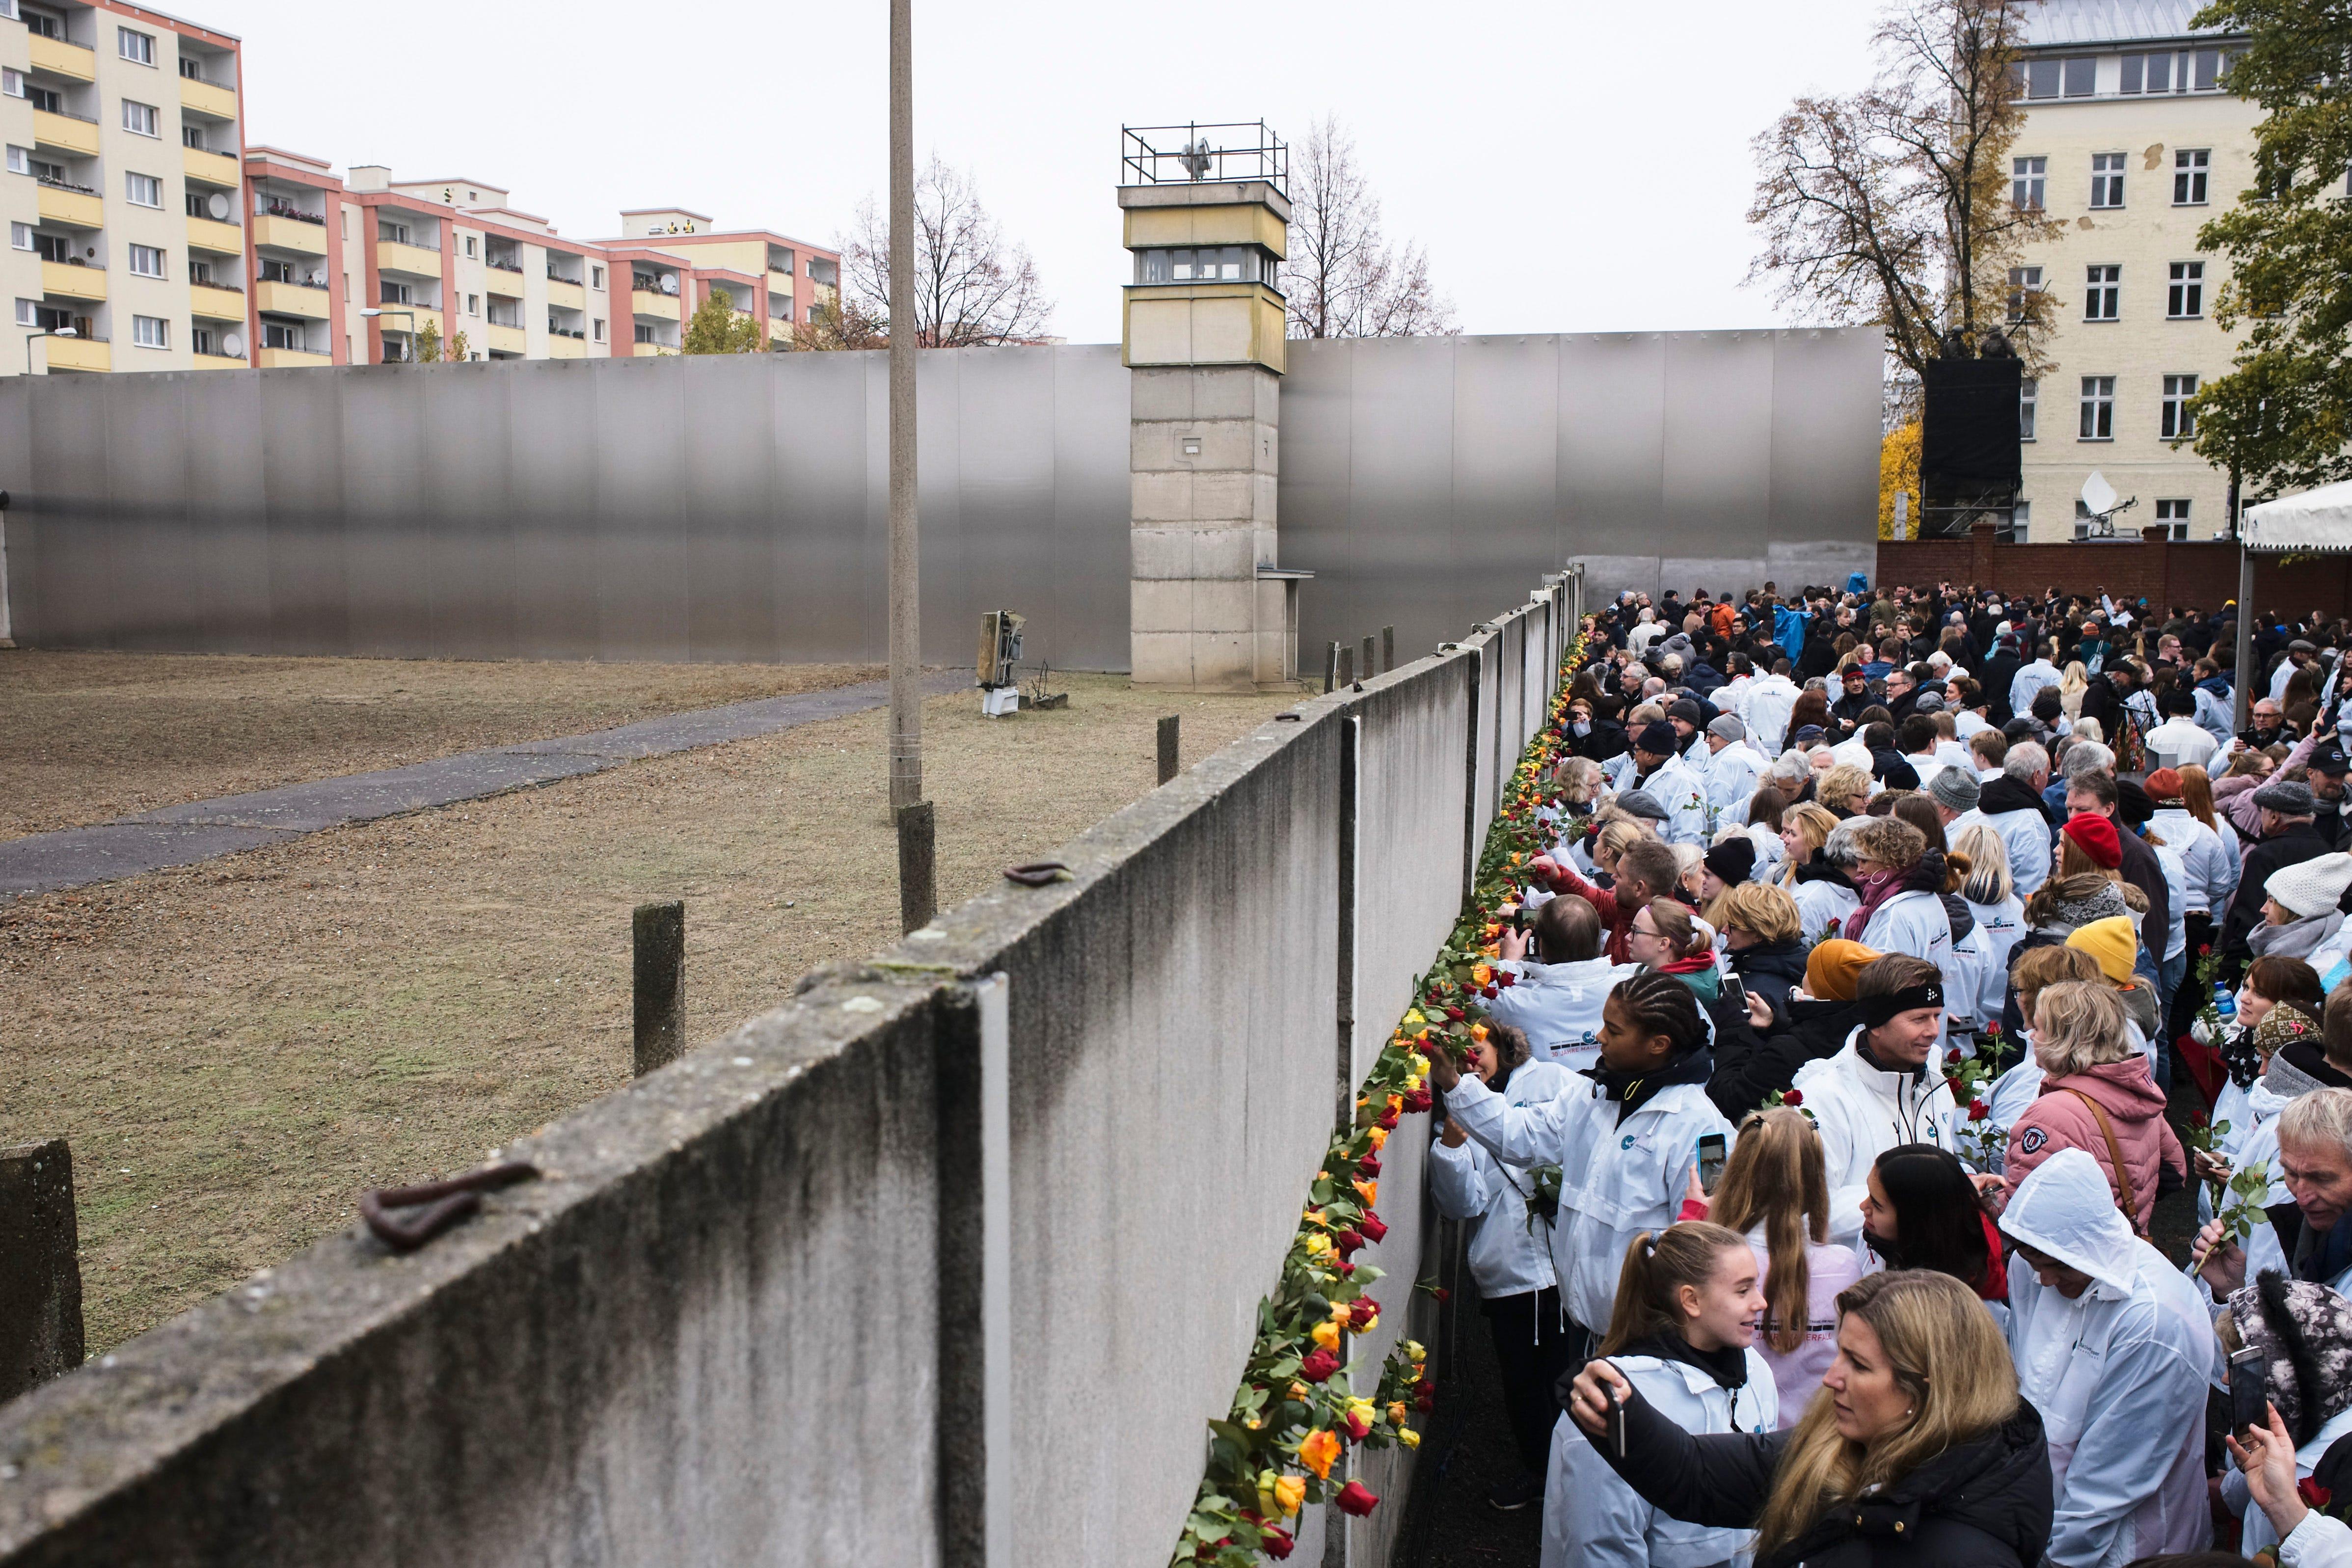 berlin wall anniversary  germany marks 30 years since